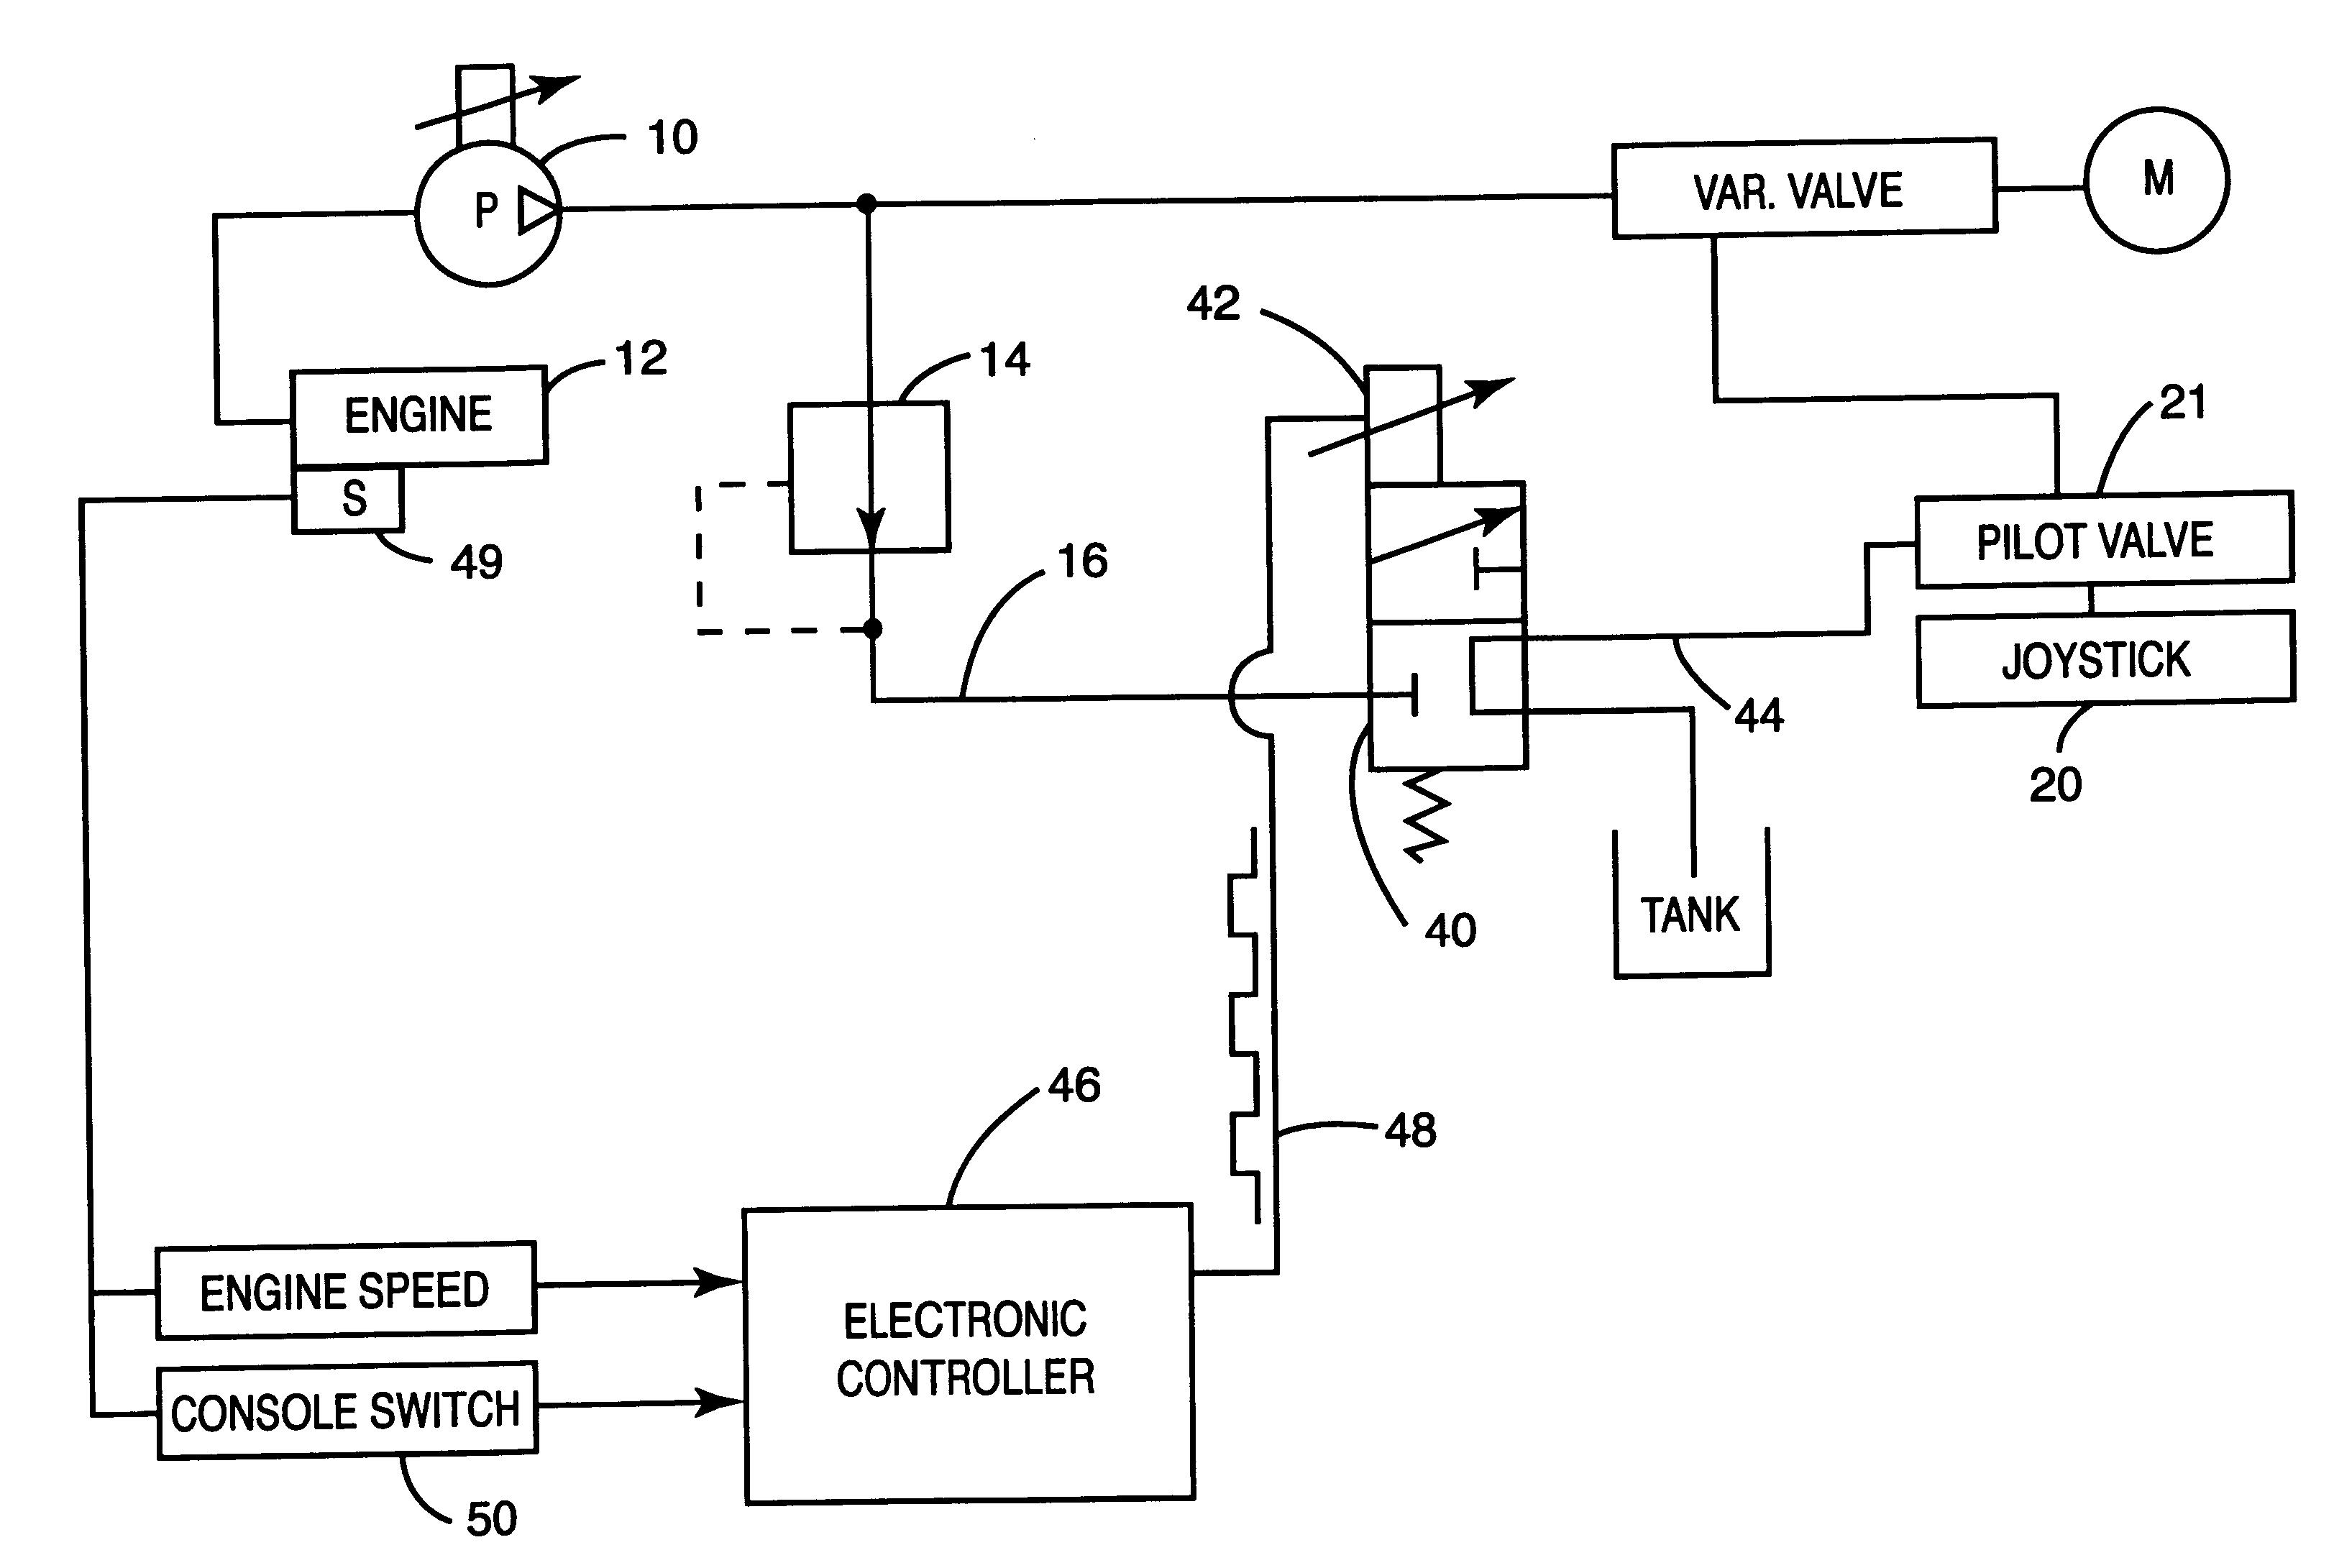 danfoss 3 port valve wiring diagram kia rio 2003 stereo library